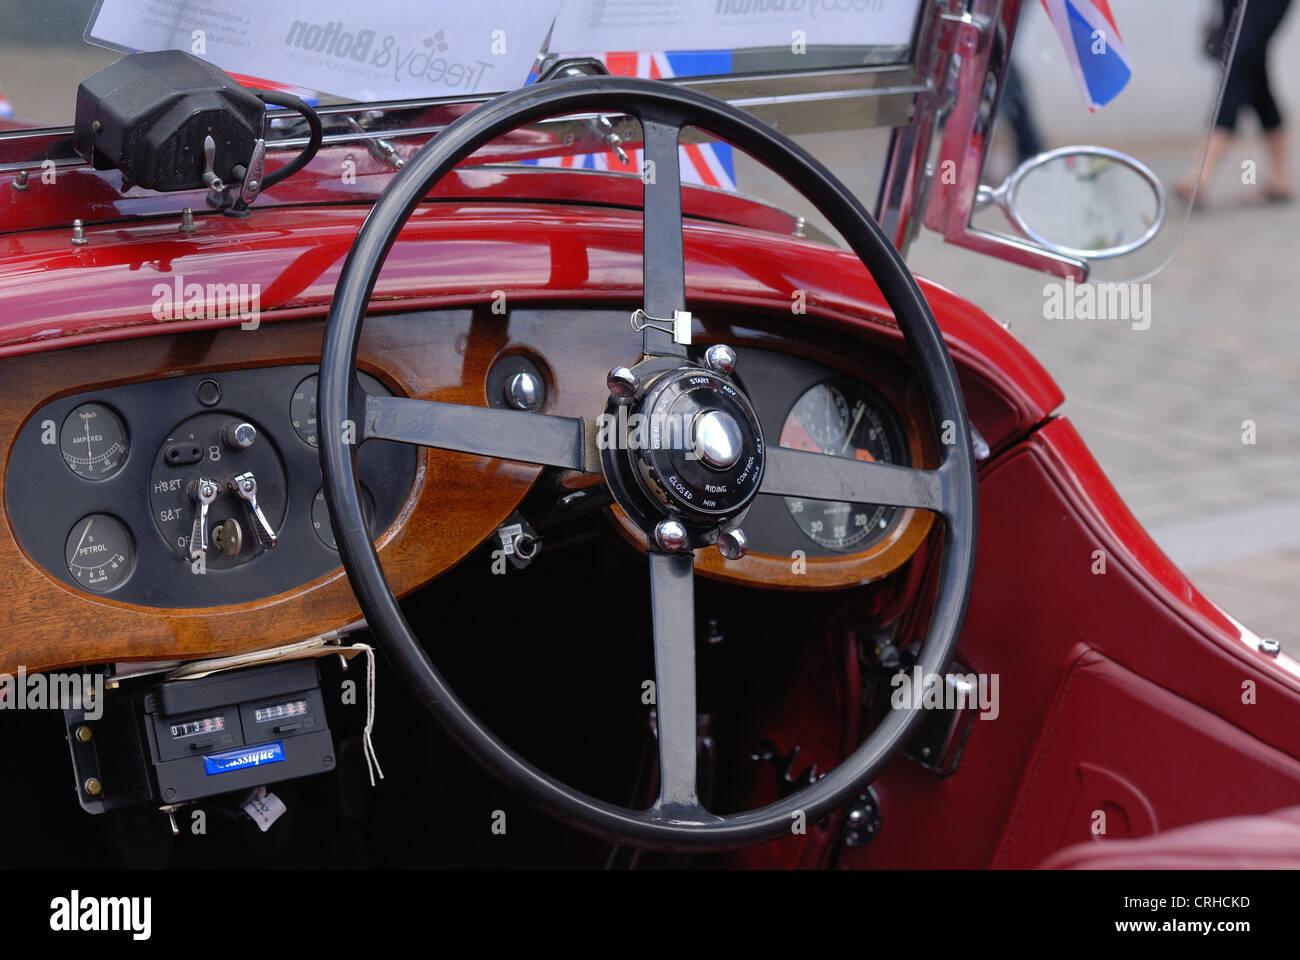 interior of an old Bentley motor car - Stock Image